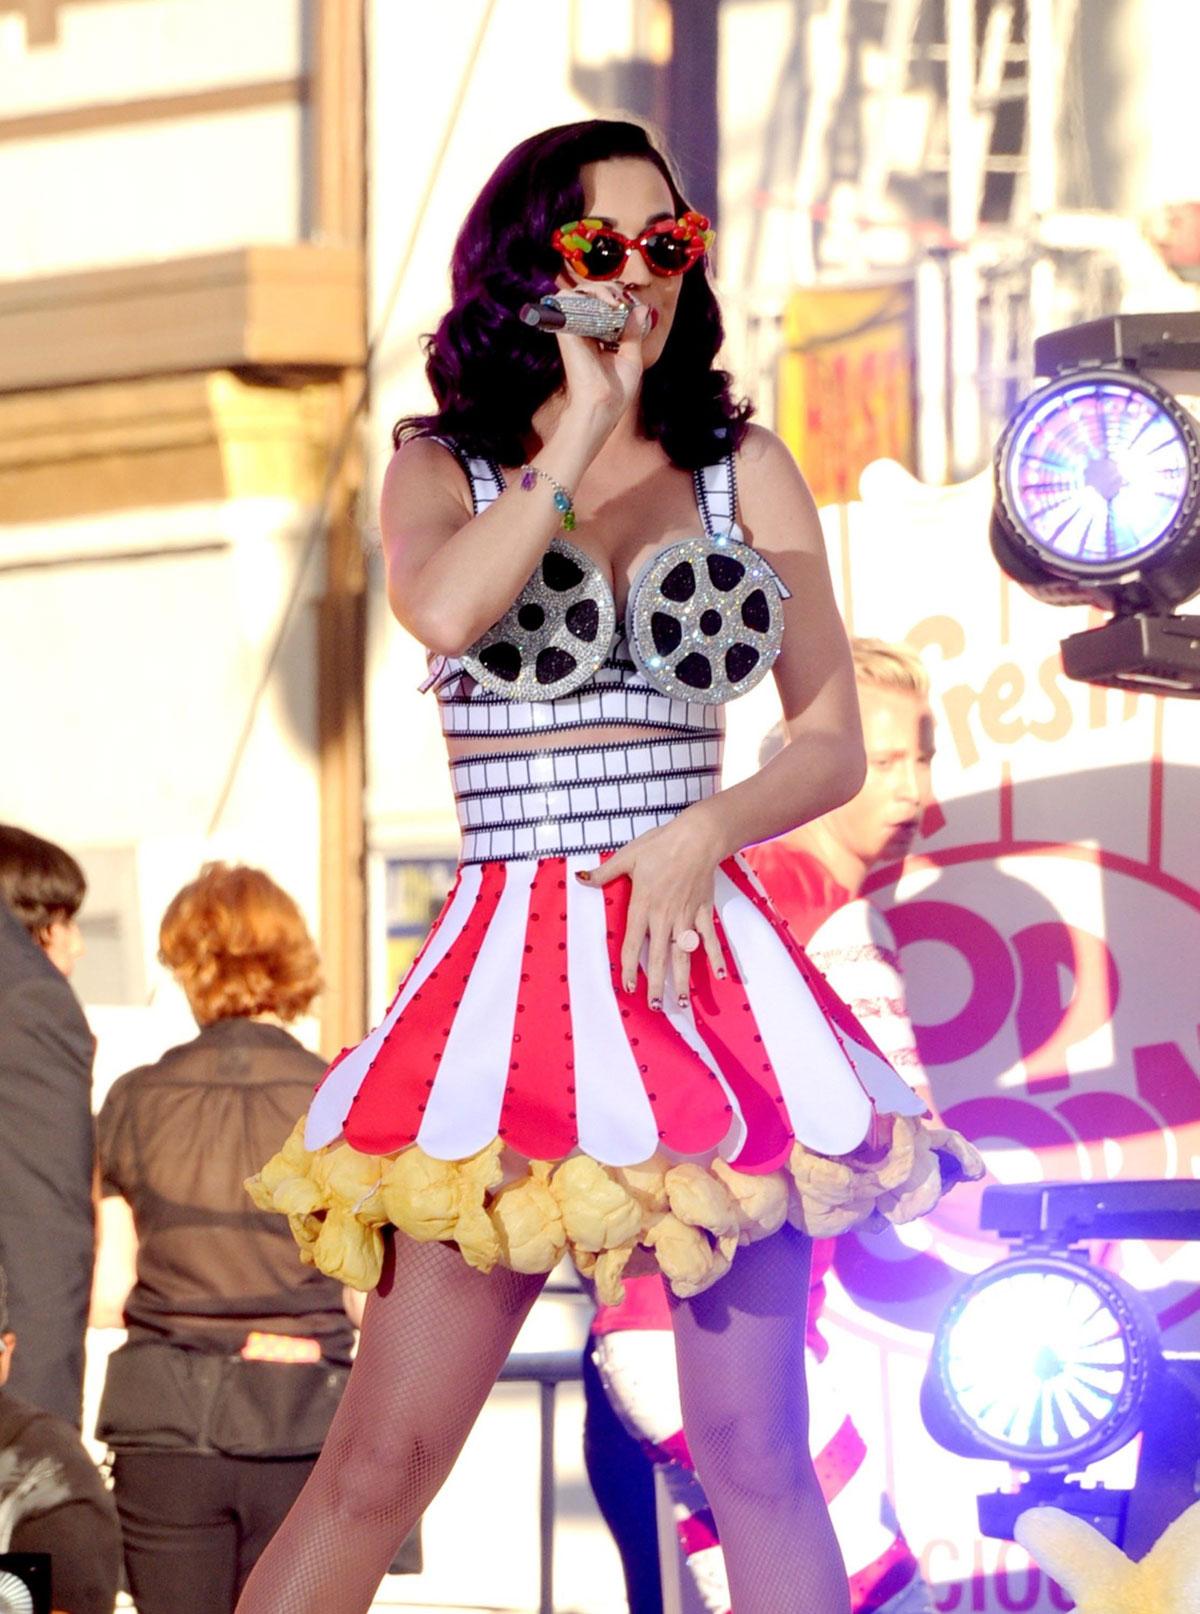 Katy perry see petticoat, sex fuck teen movies